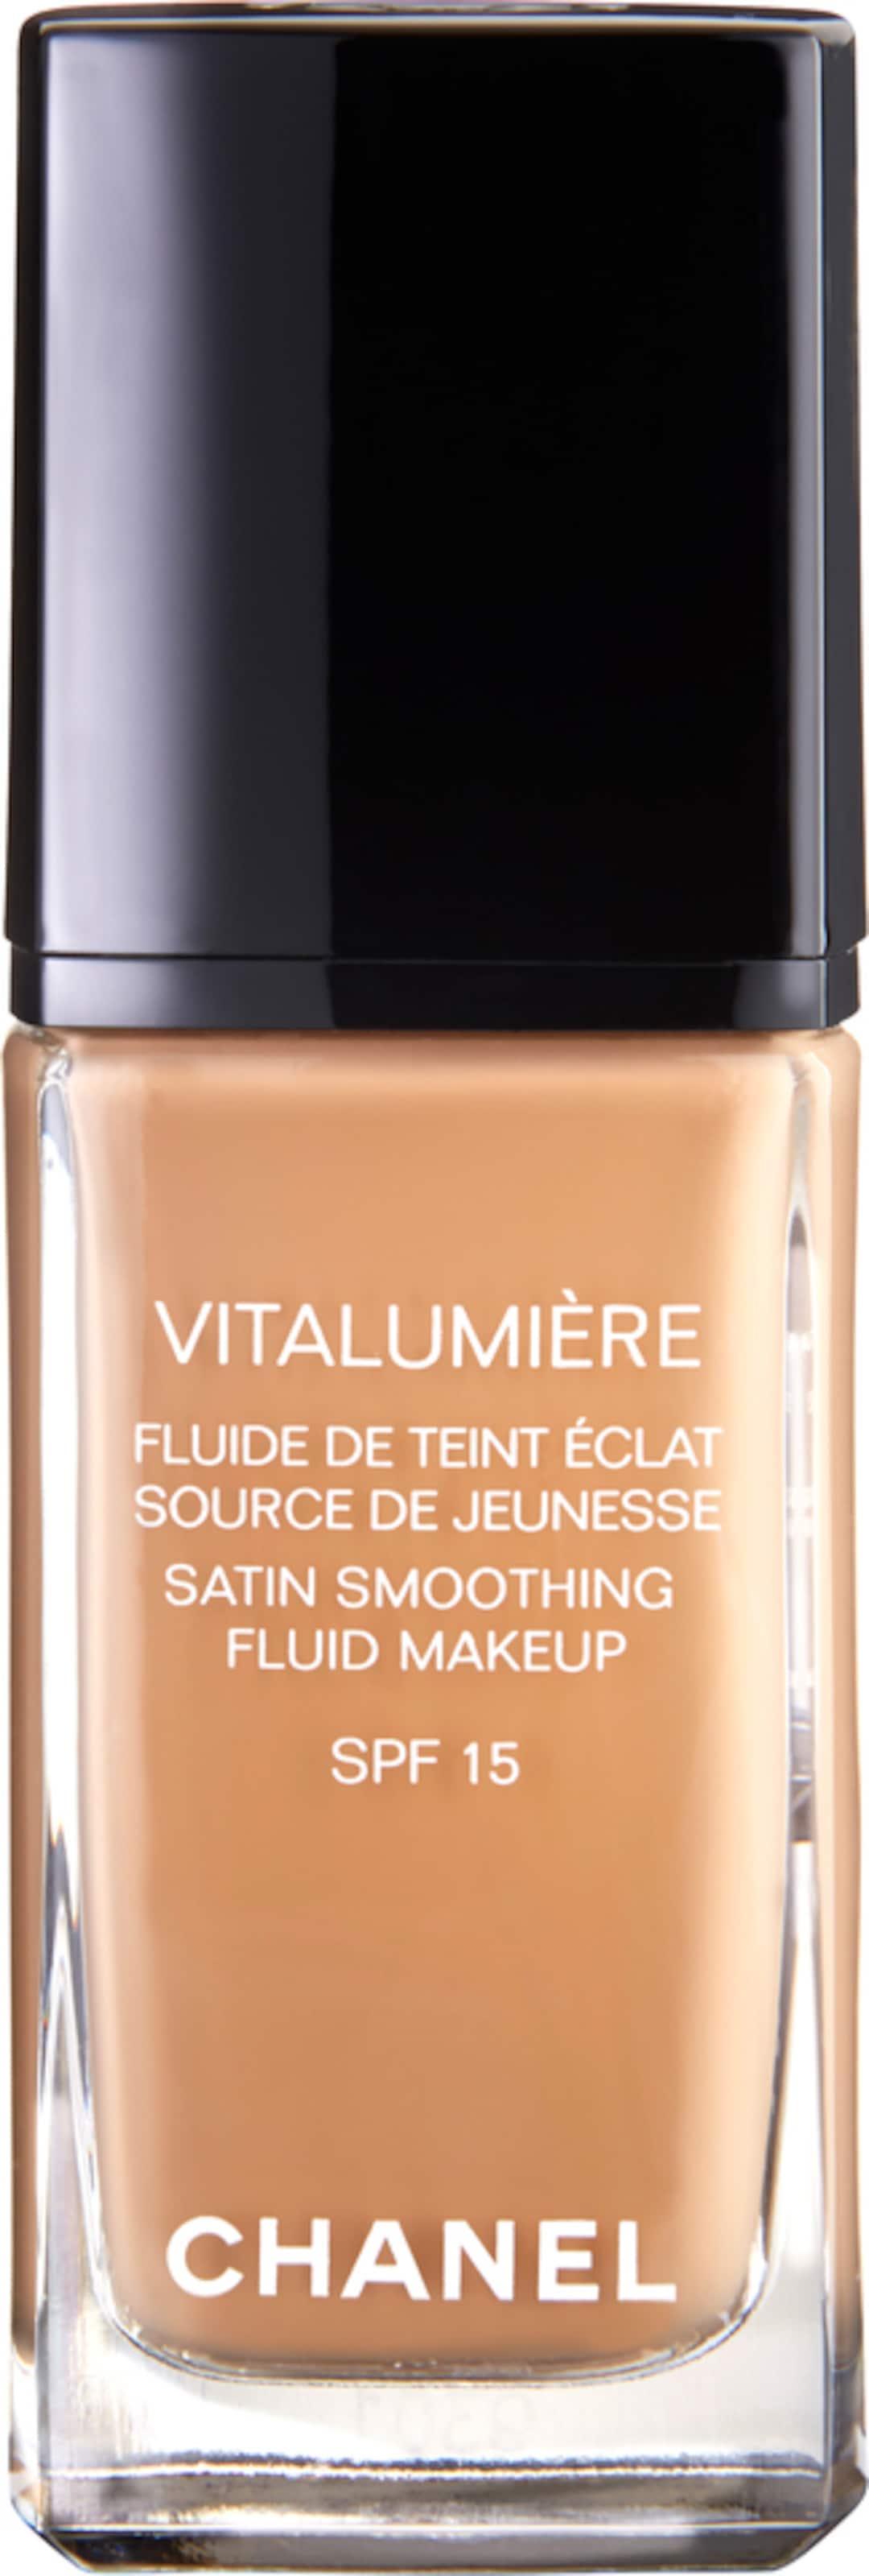 Billig Verkauf 2018 Footlocker Bilder Verkauf Online CHANEL 'Vitalumière Fluide' Fluid-Make-up Billig Besuch Neu Am Billigsten T7sJtphSP5